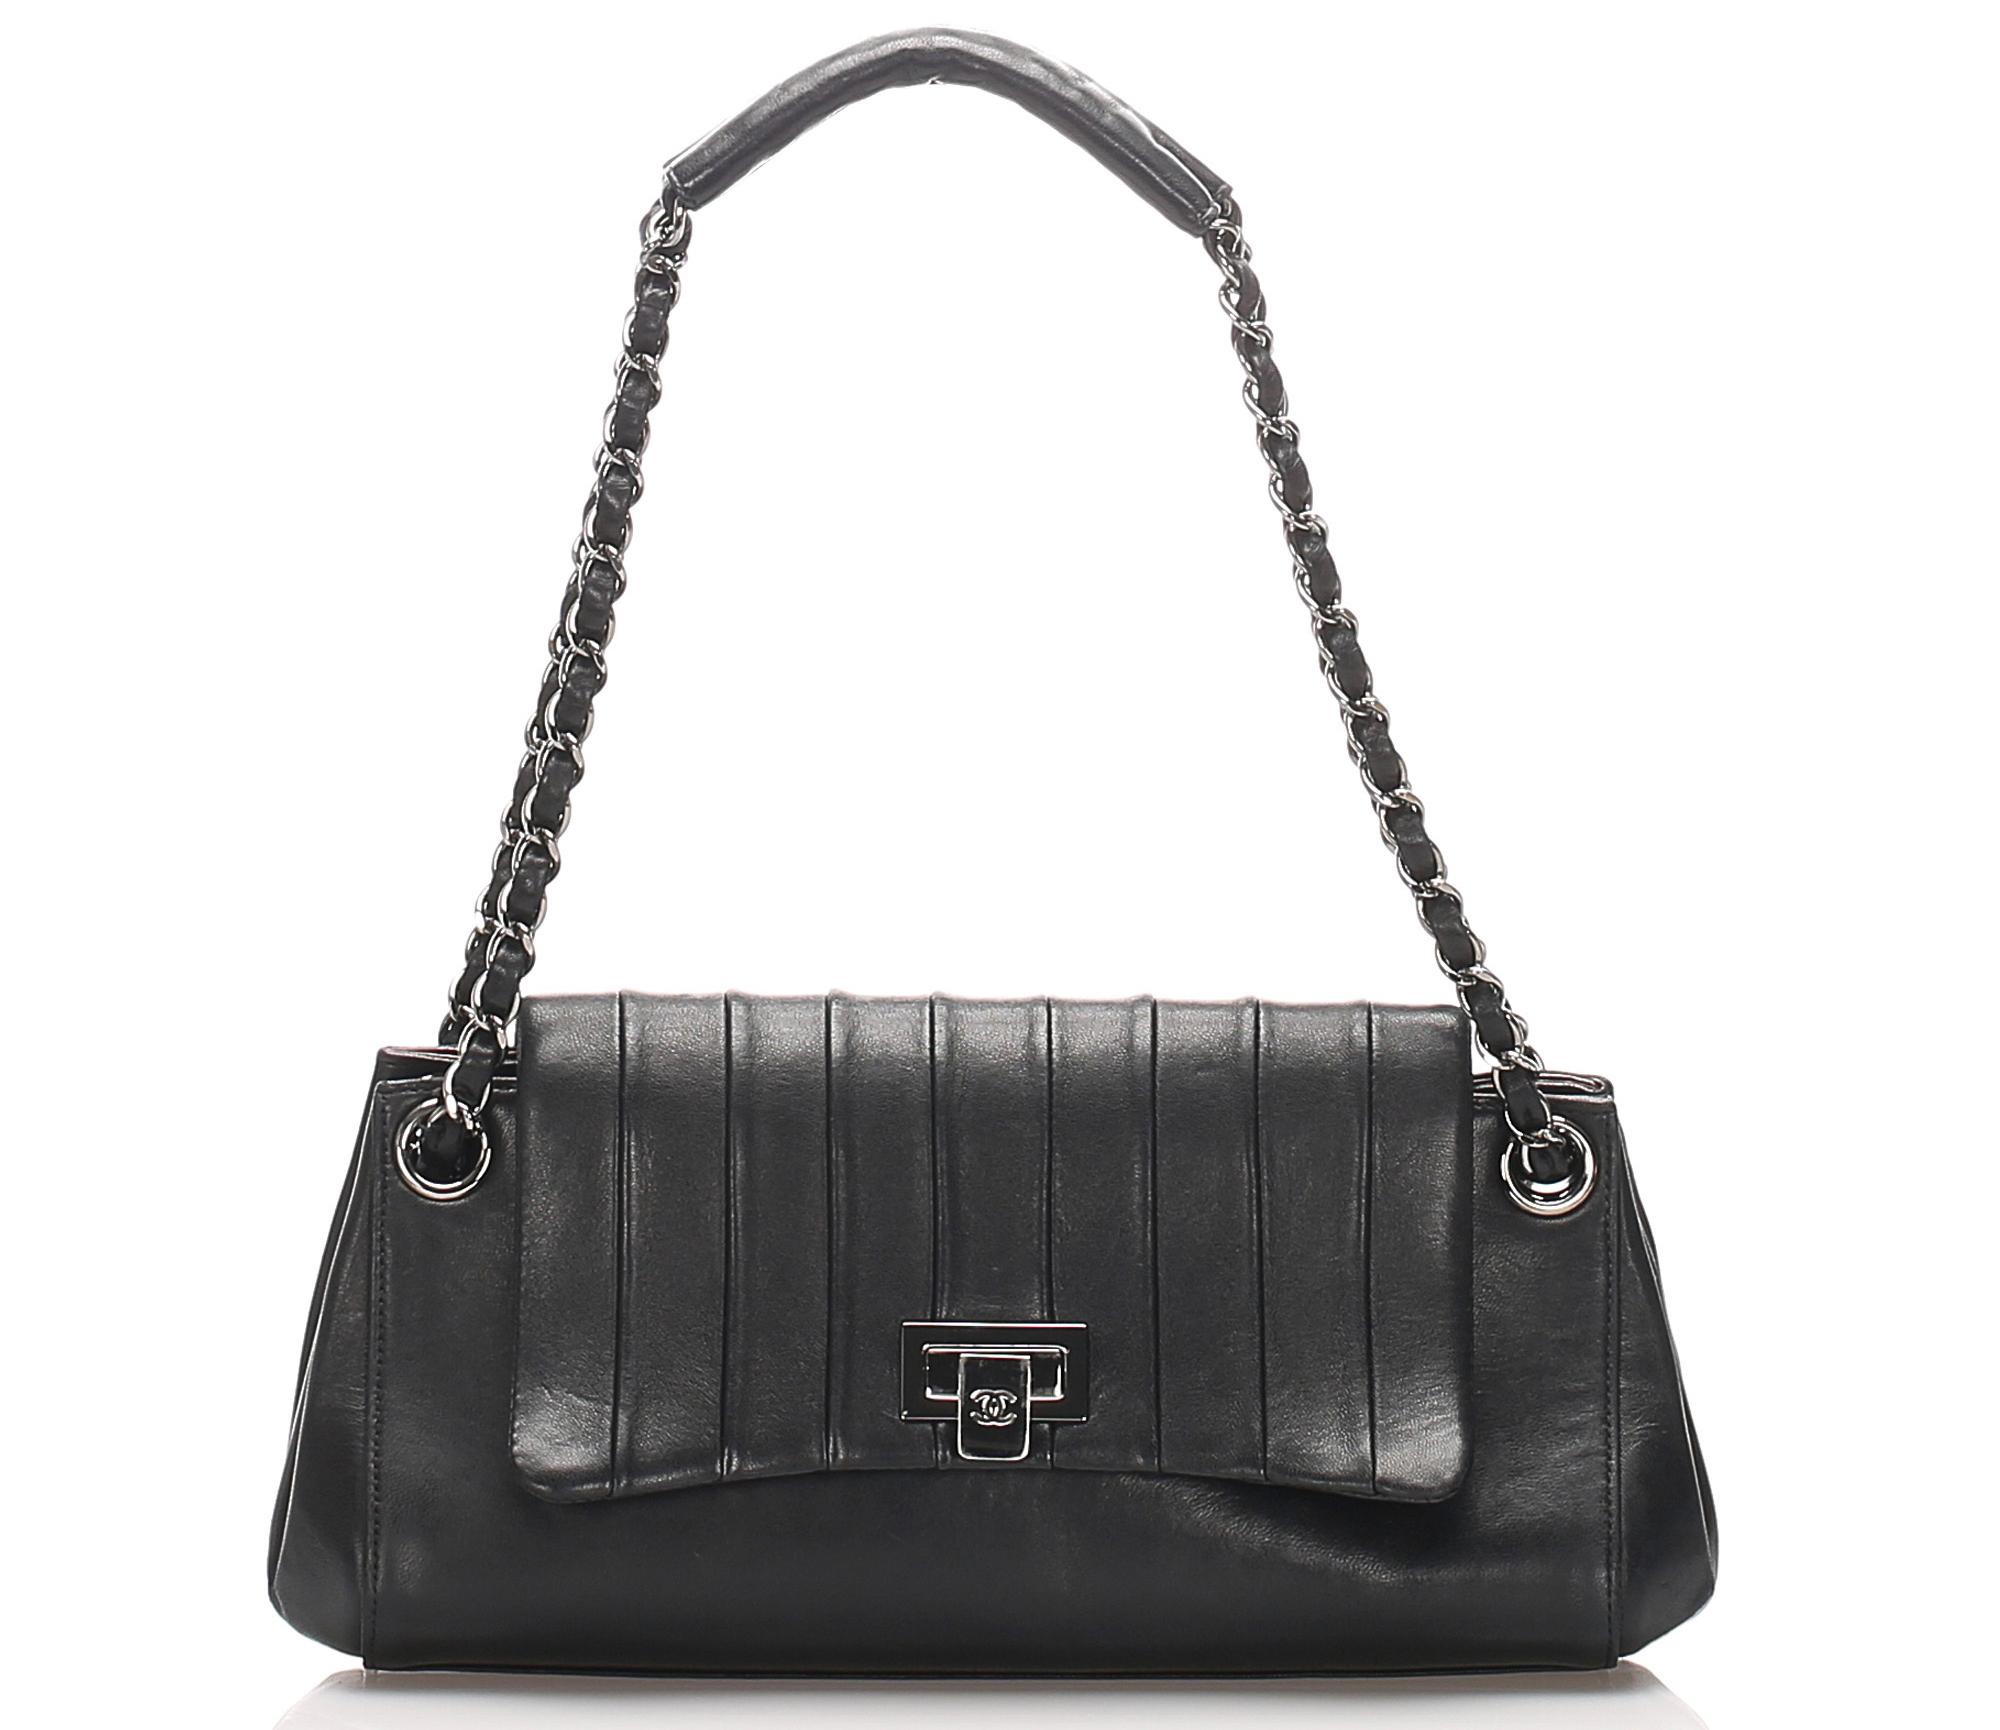 Chanel Reissue Lambskin Leather Shoulder Bag